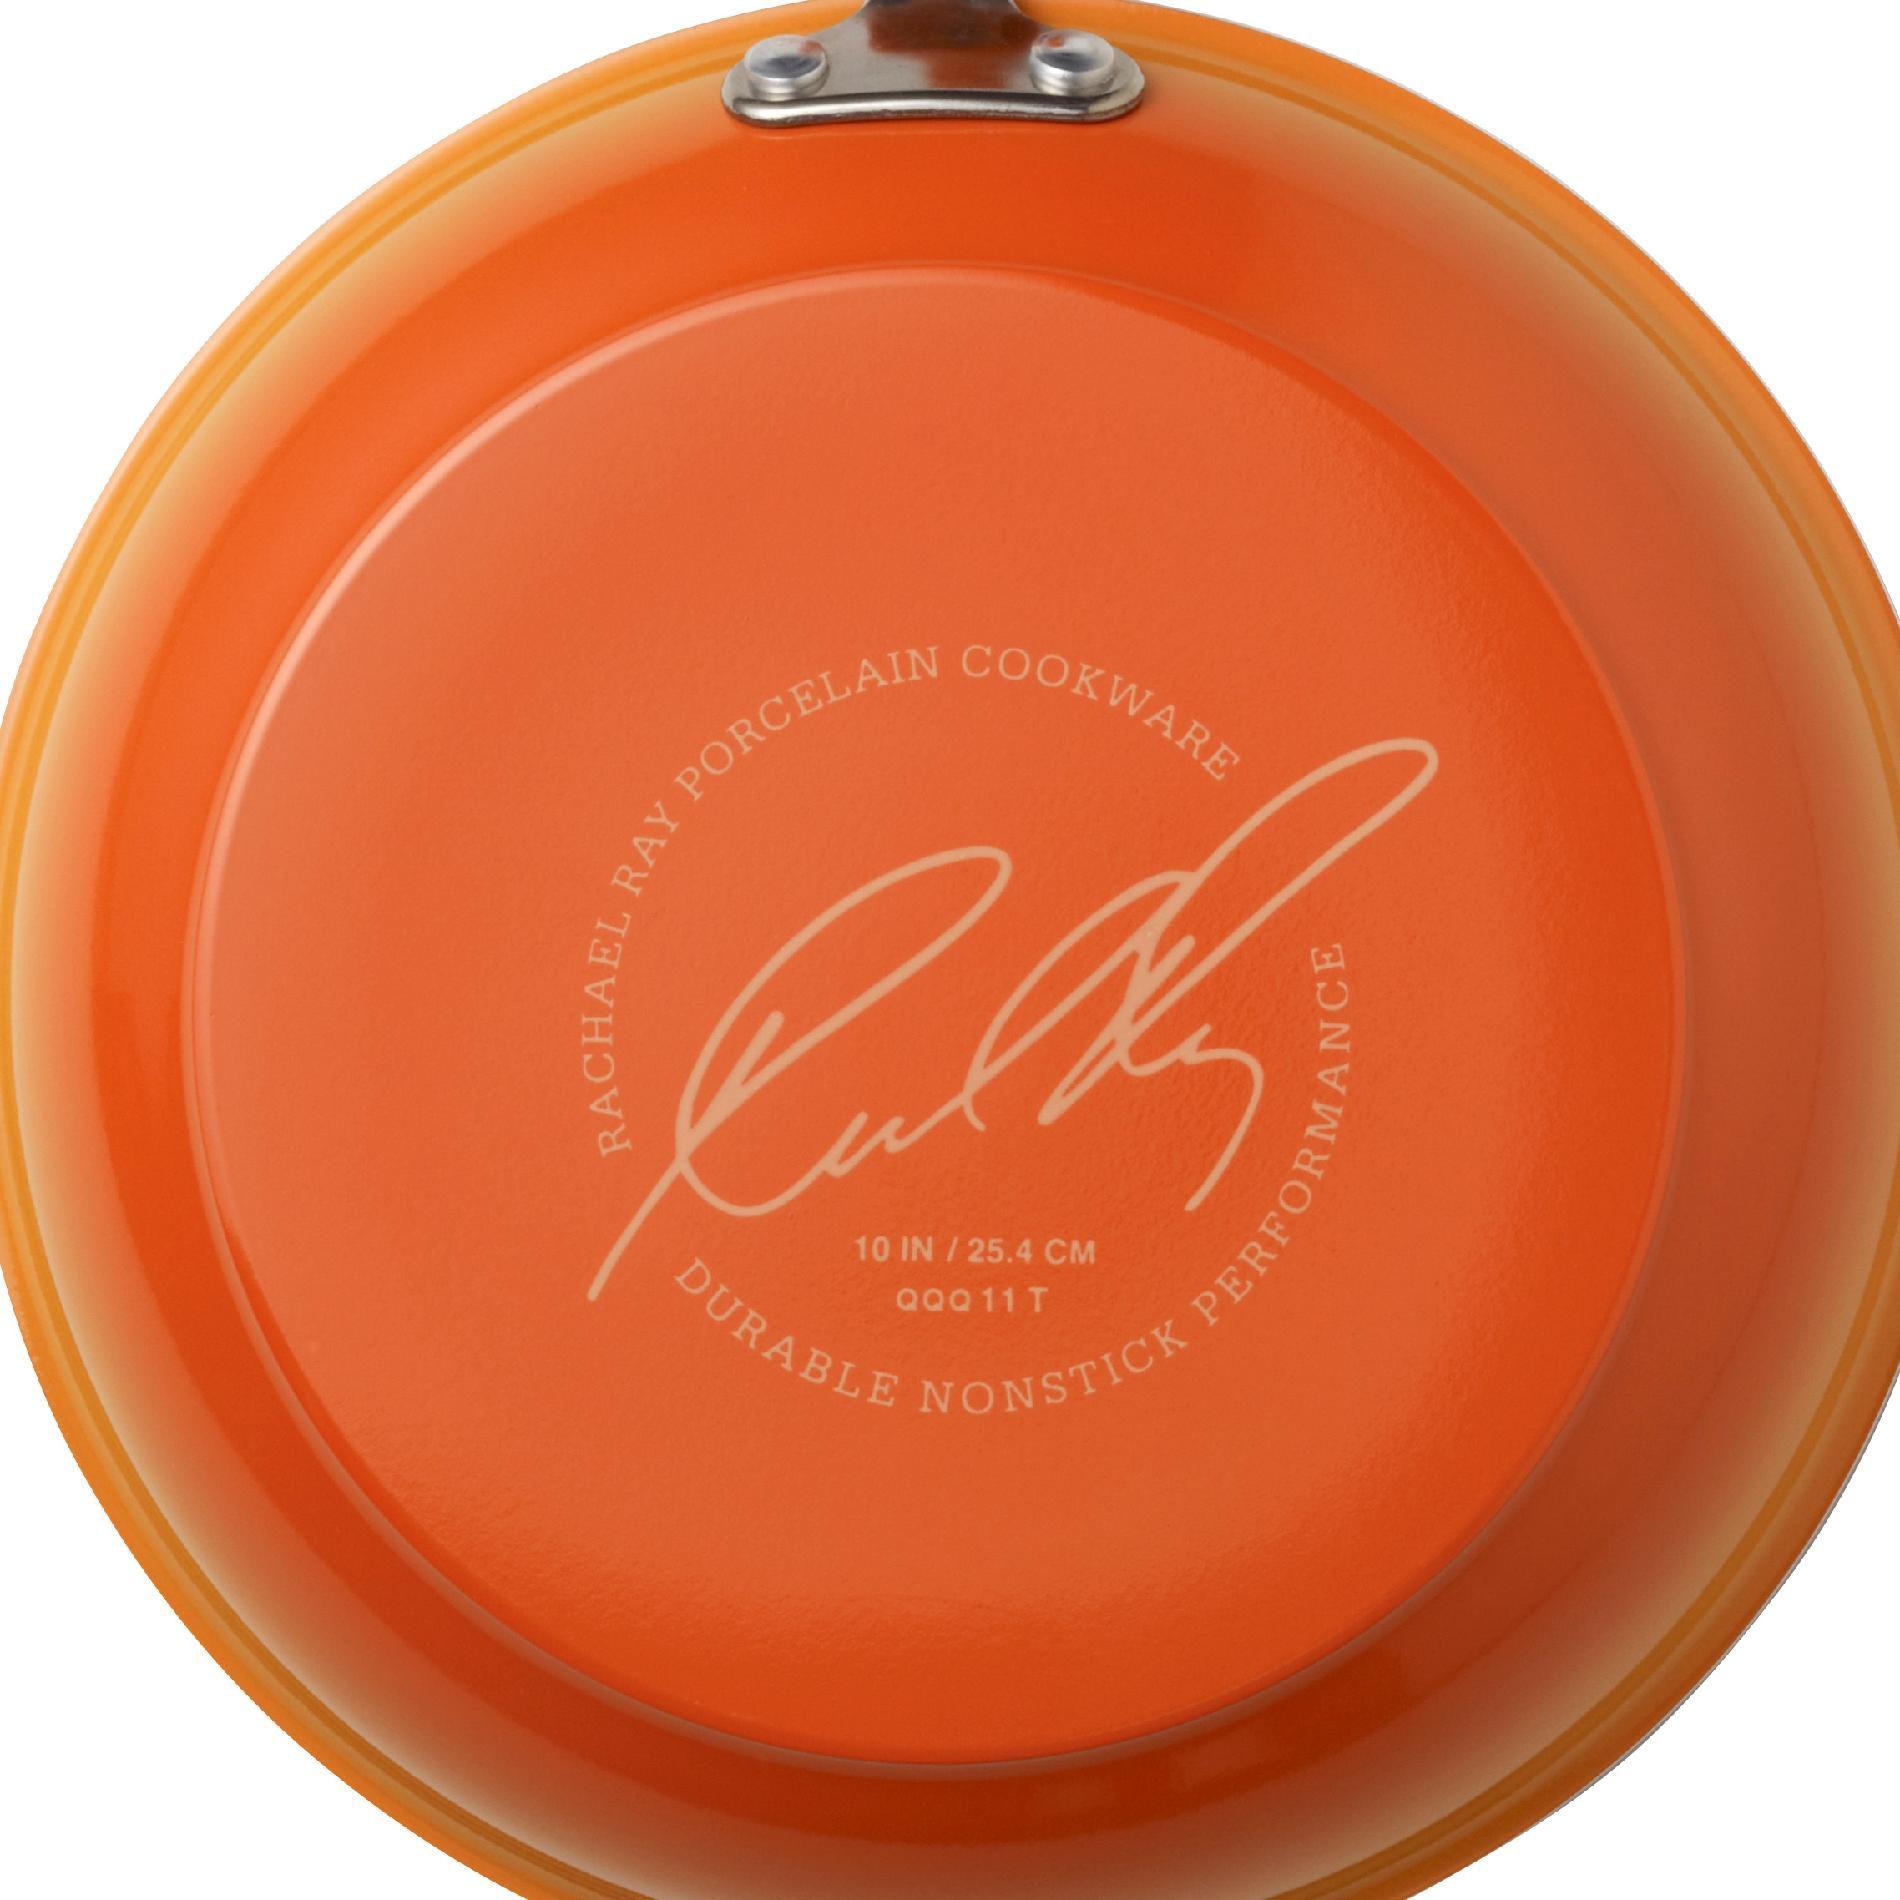 Rachael Ray 10-Piece Porcelain Enamel Non-Stick Orange Cookware Set